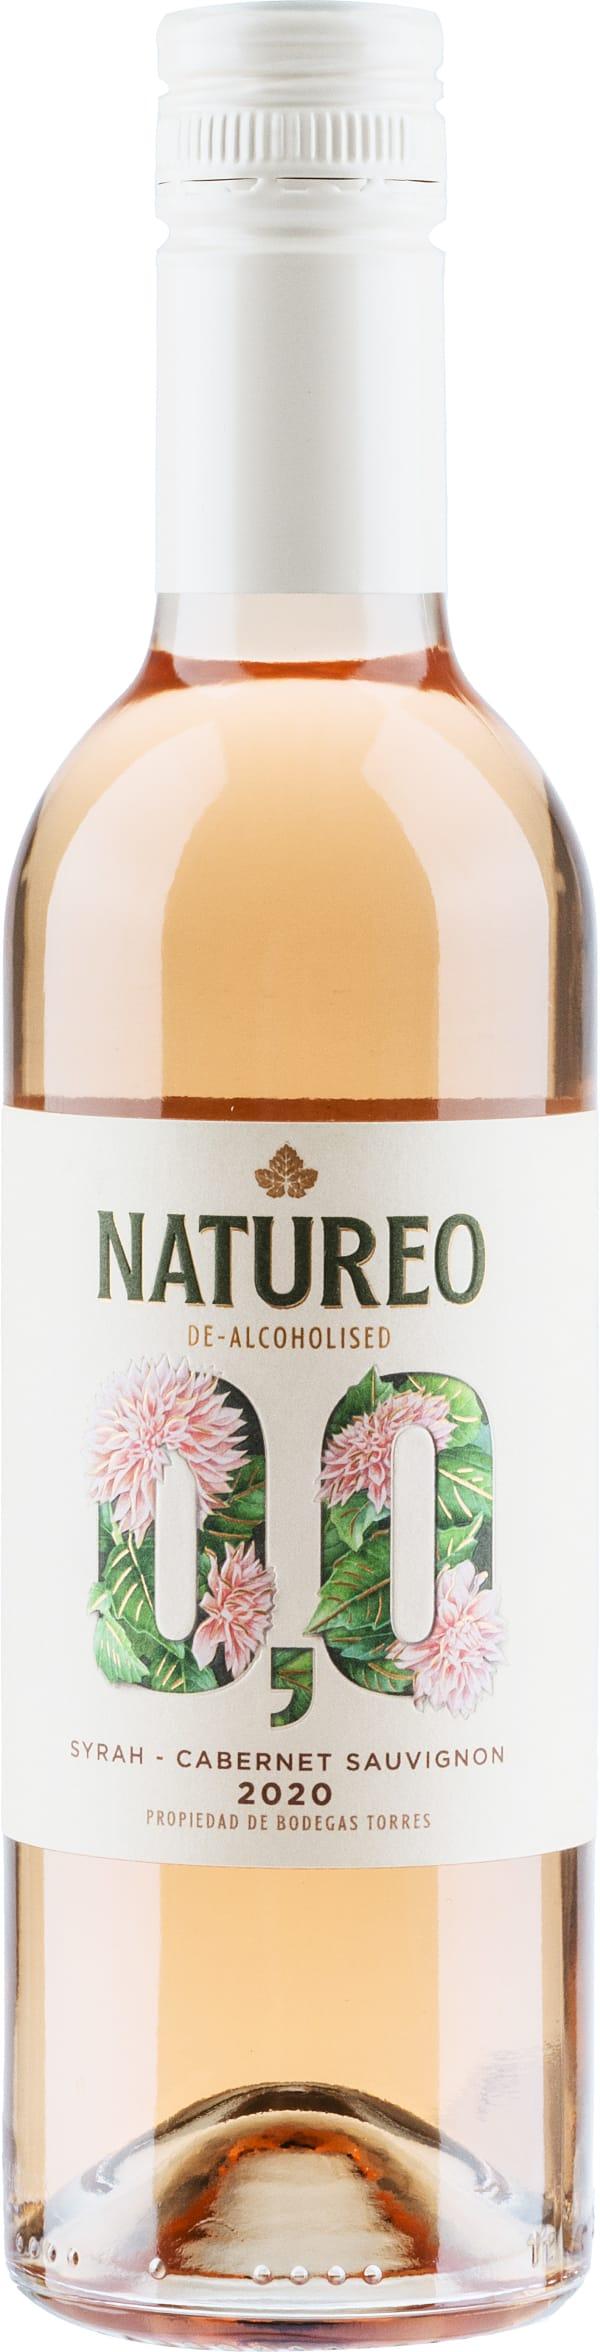 Torres Natureo Rosé 2016